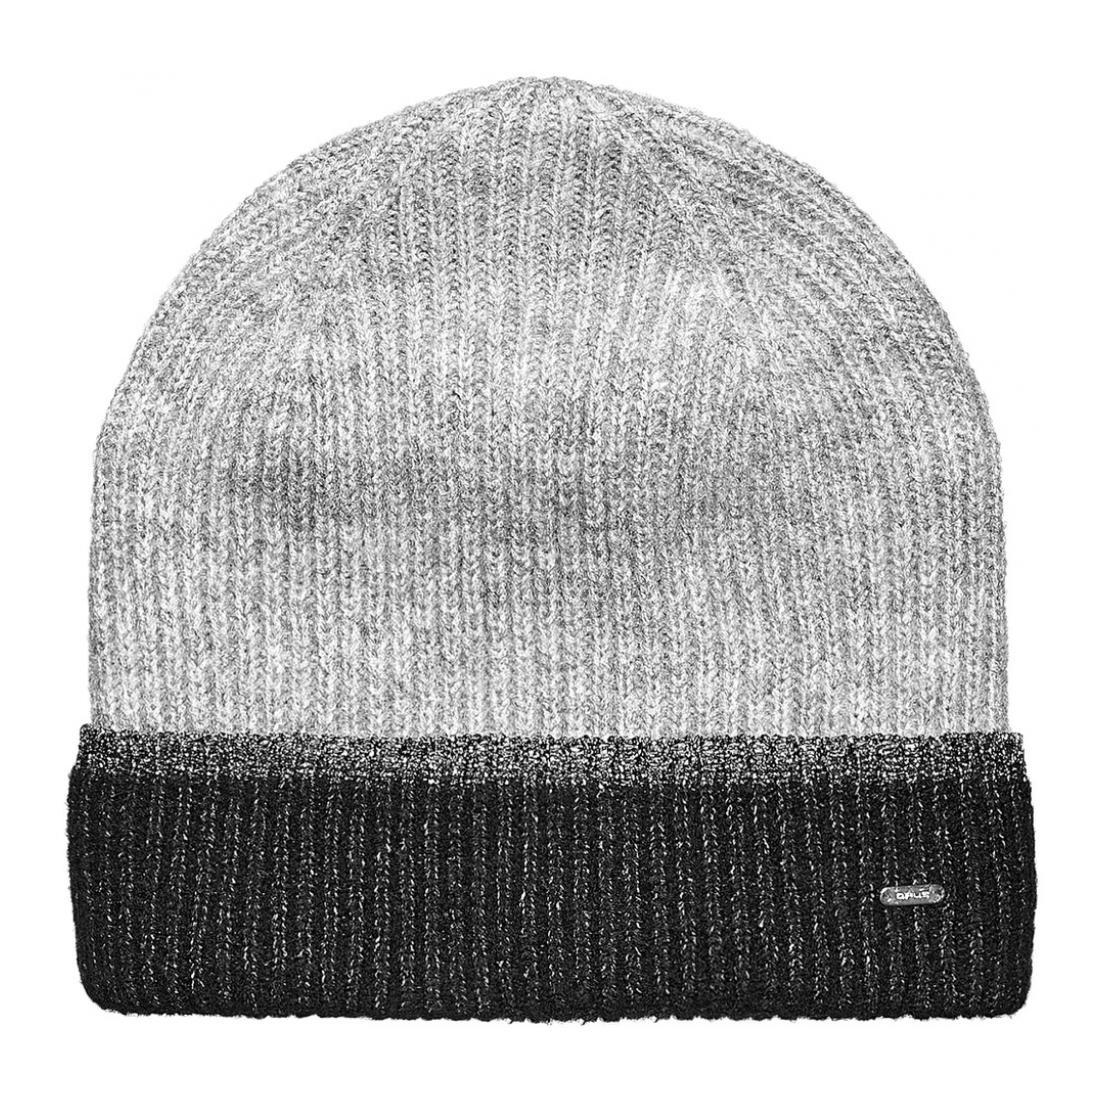 Opus Mützen Stirnband/Handschuhe Atippa cap